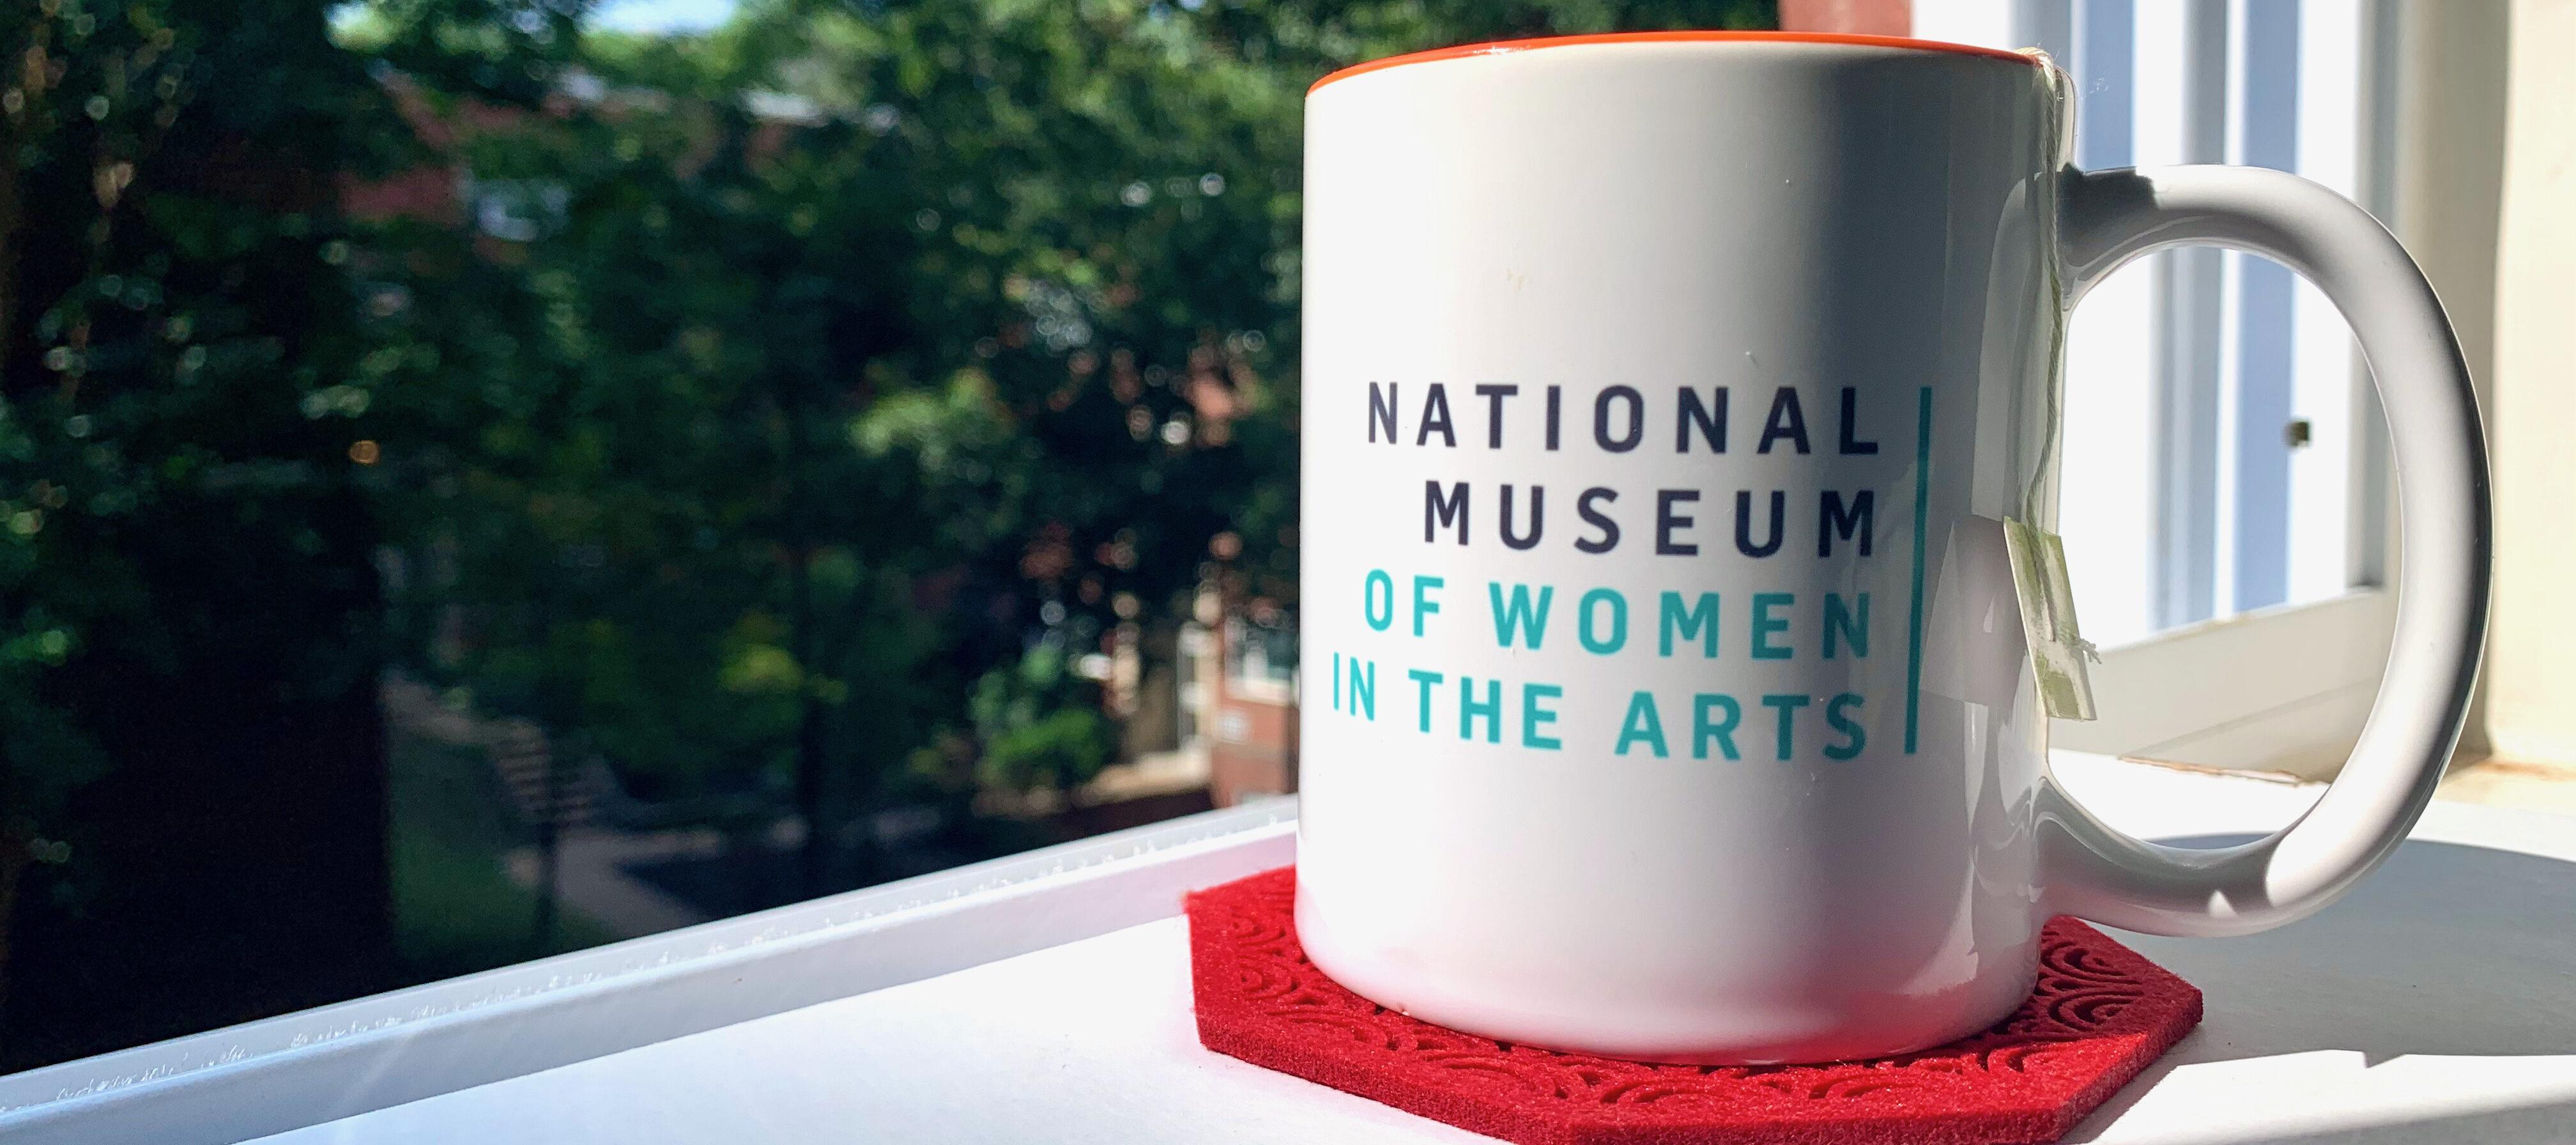 A white mug with